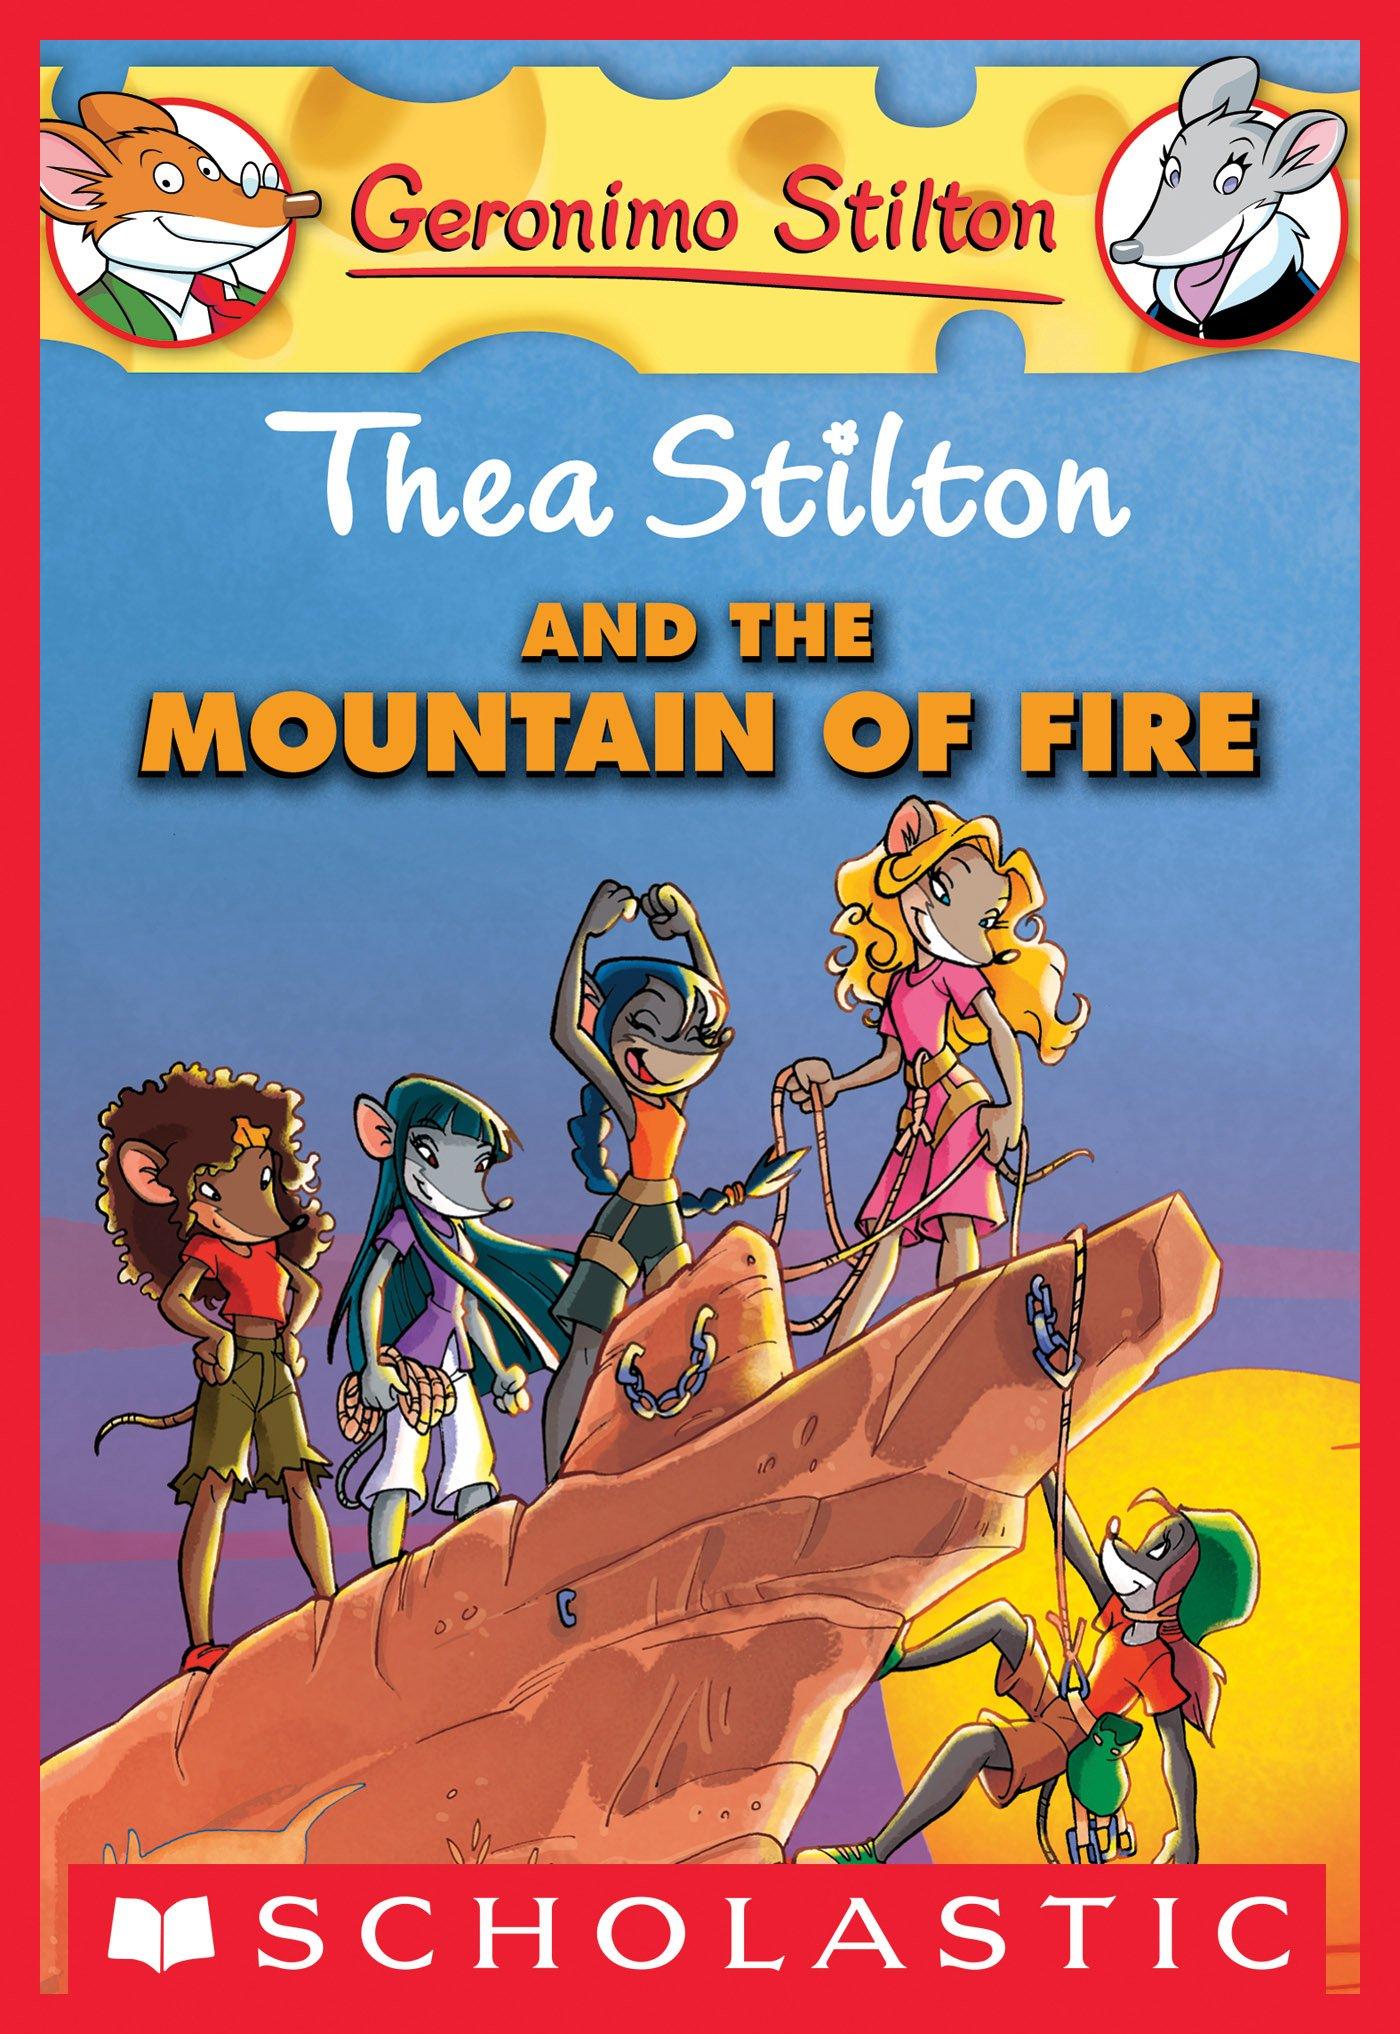 Thea Stilton and the Mountain of Fire (Thea Stilton Graphic Novels Book 2) (English Edition)